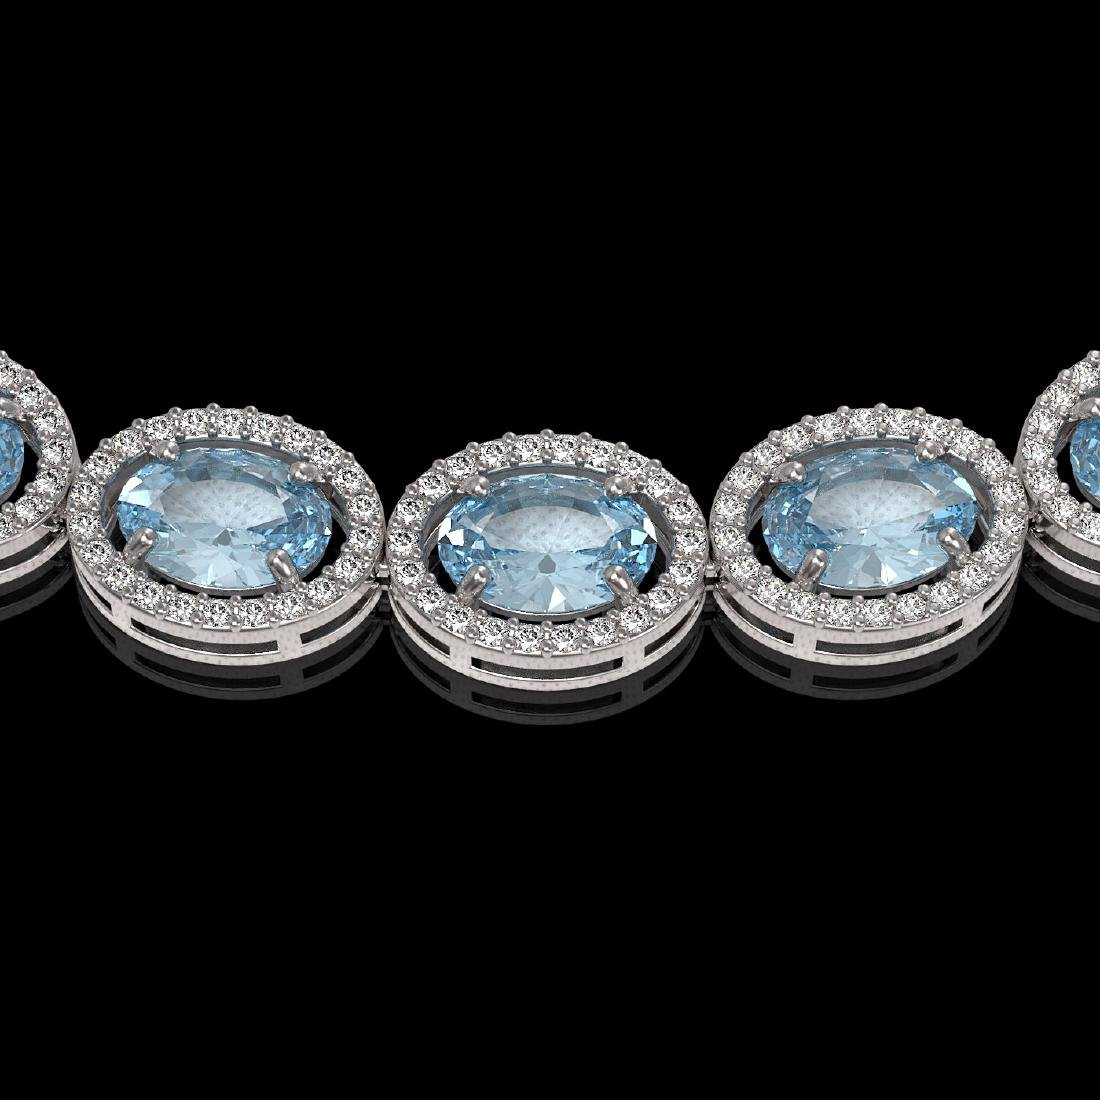 41.88 CTW Aquamarine & Diamond Halo Necklace 10K White - 3